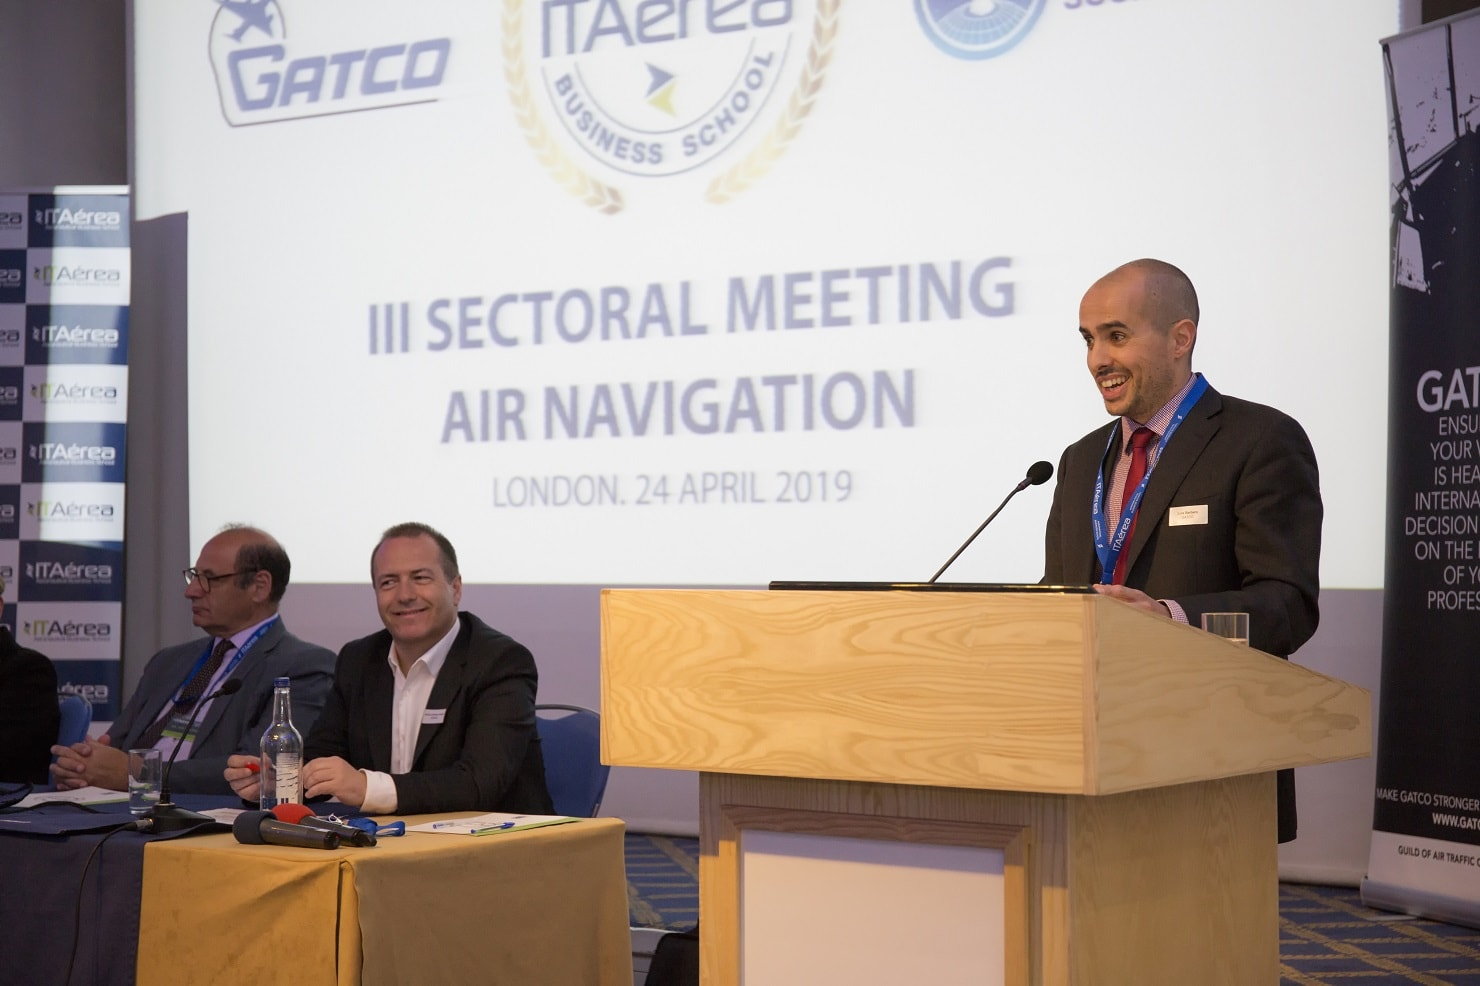 10 min - III Sector Meeting: Air Navigation